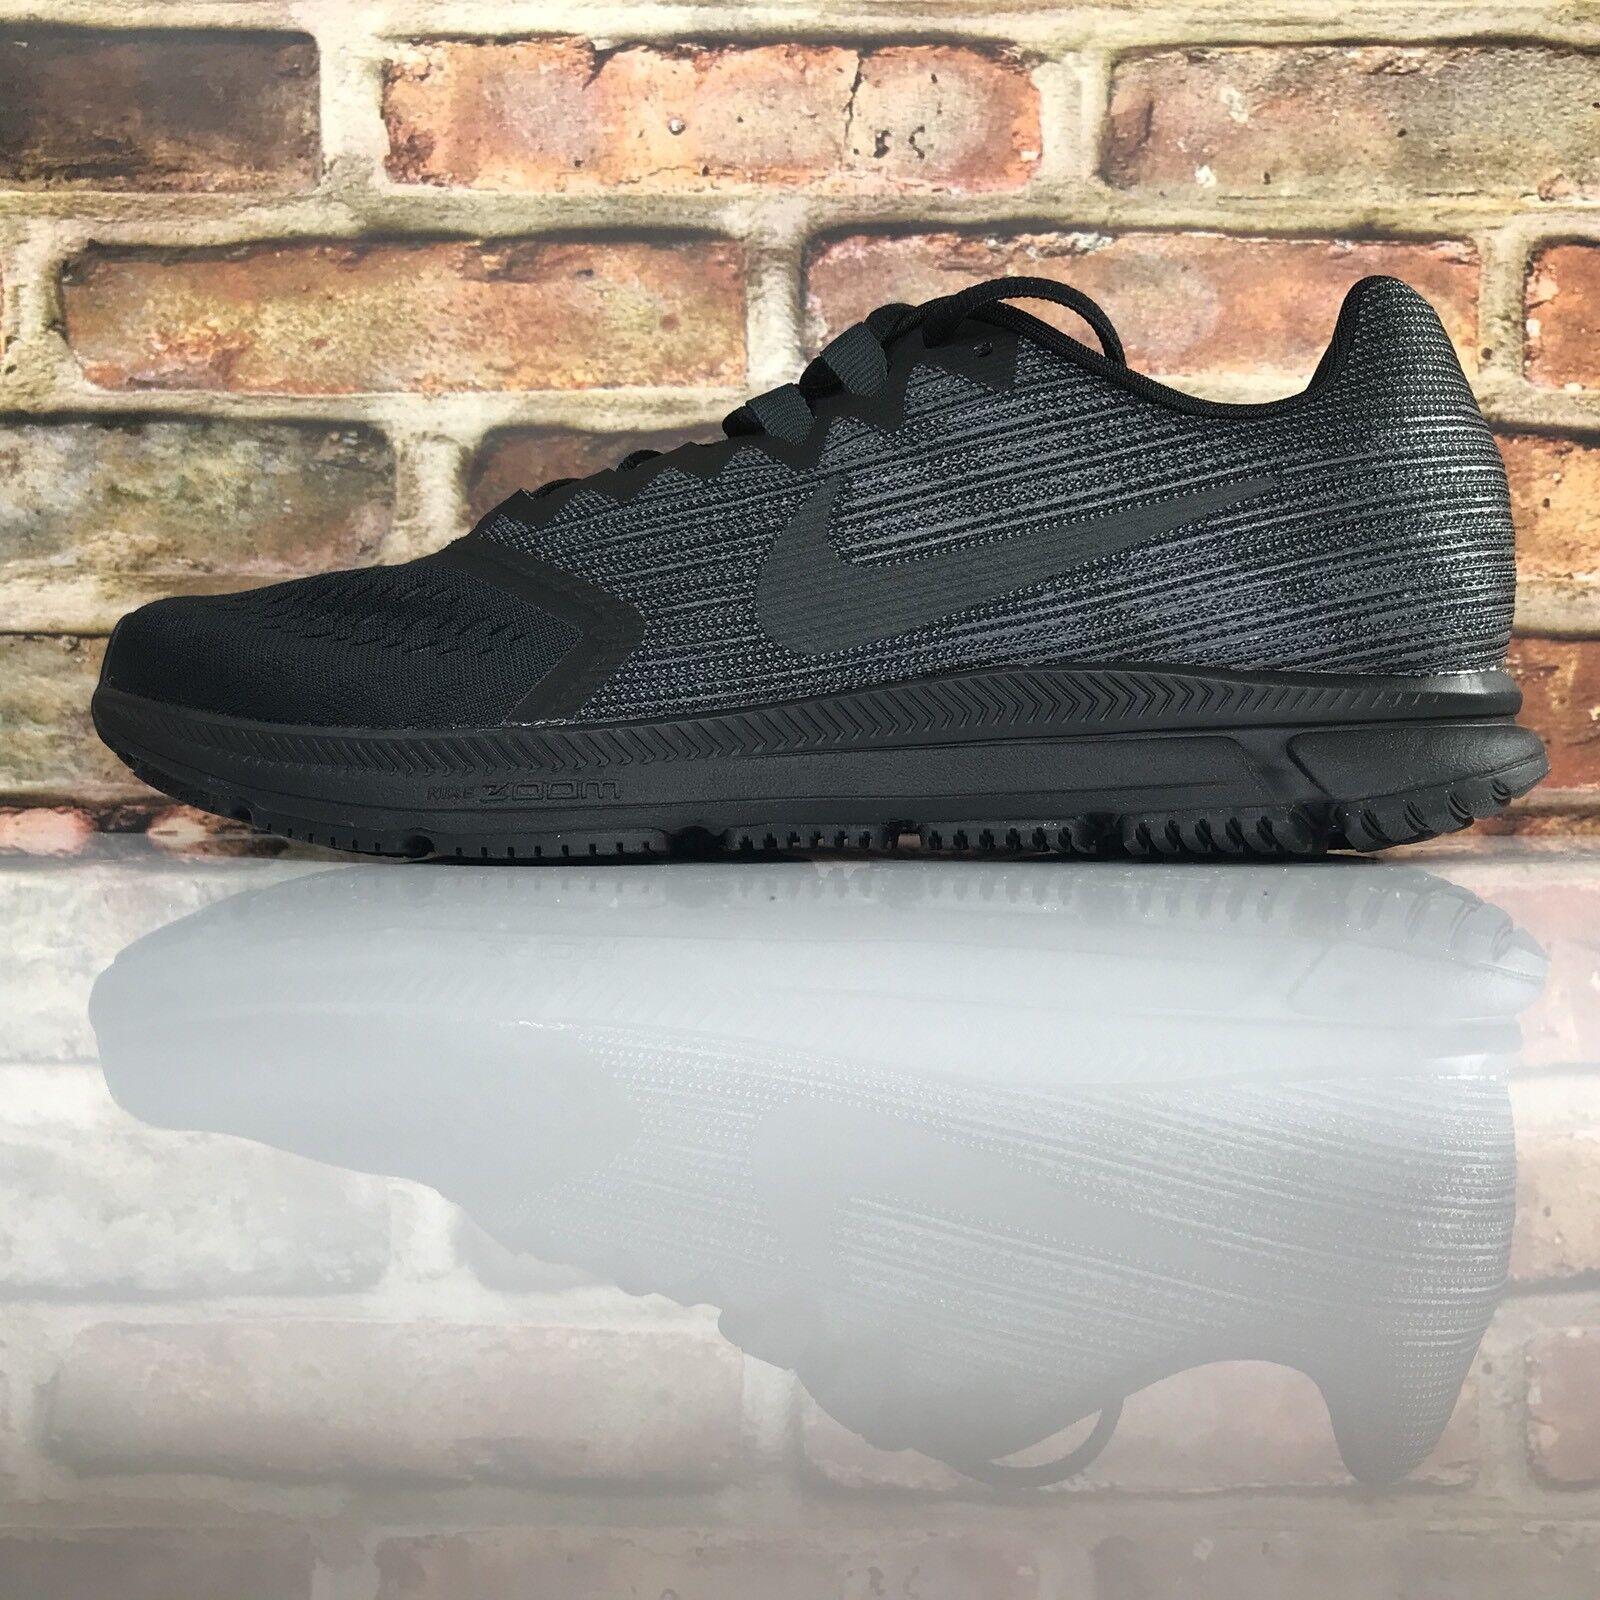 Nike Zoom Span 2 Mens Size 11 Running shoes Training Black Dark Grey 908990 011